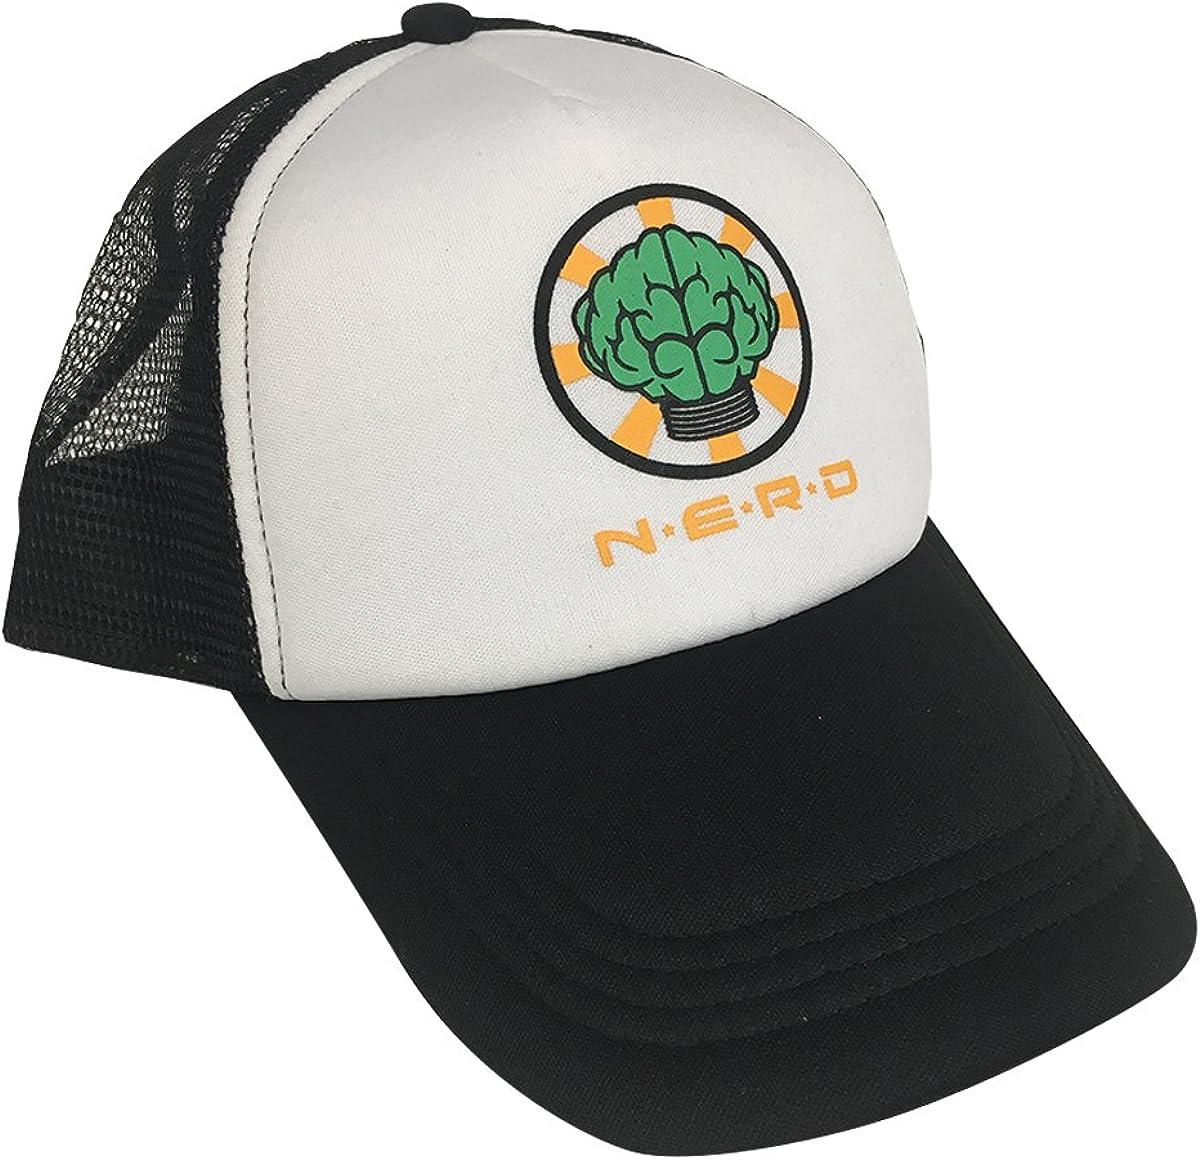 NERD sale Trucker Black Max 70% OFF Hat